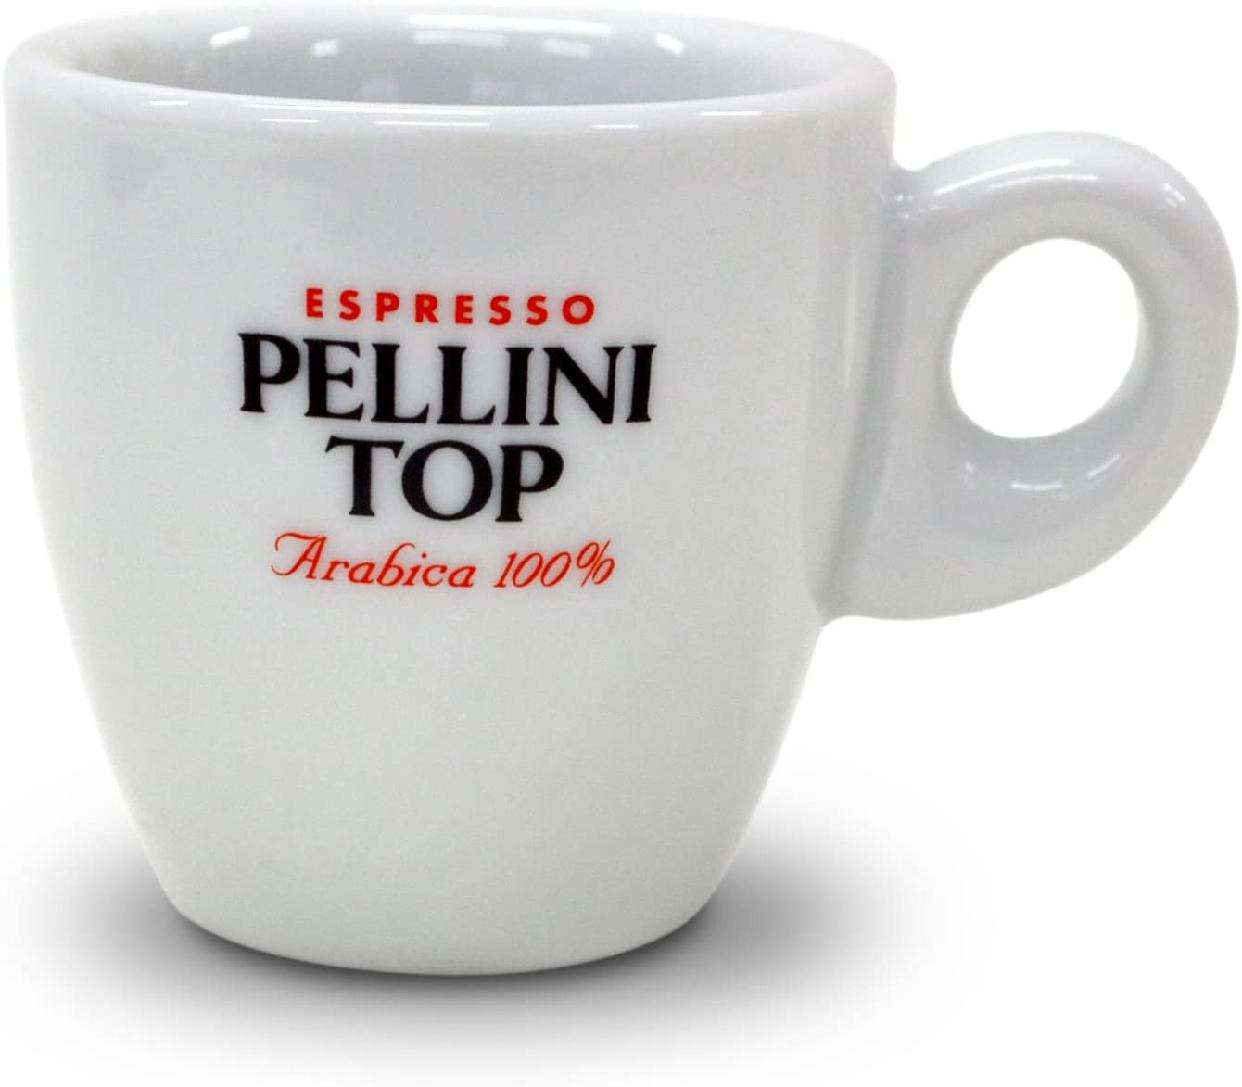 PELLINI(ペリーニ) エスプレッソカップ ヌオバ ソーサー付 1客 PLESCP1の商品画像2